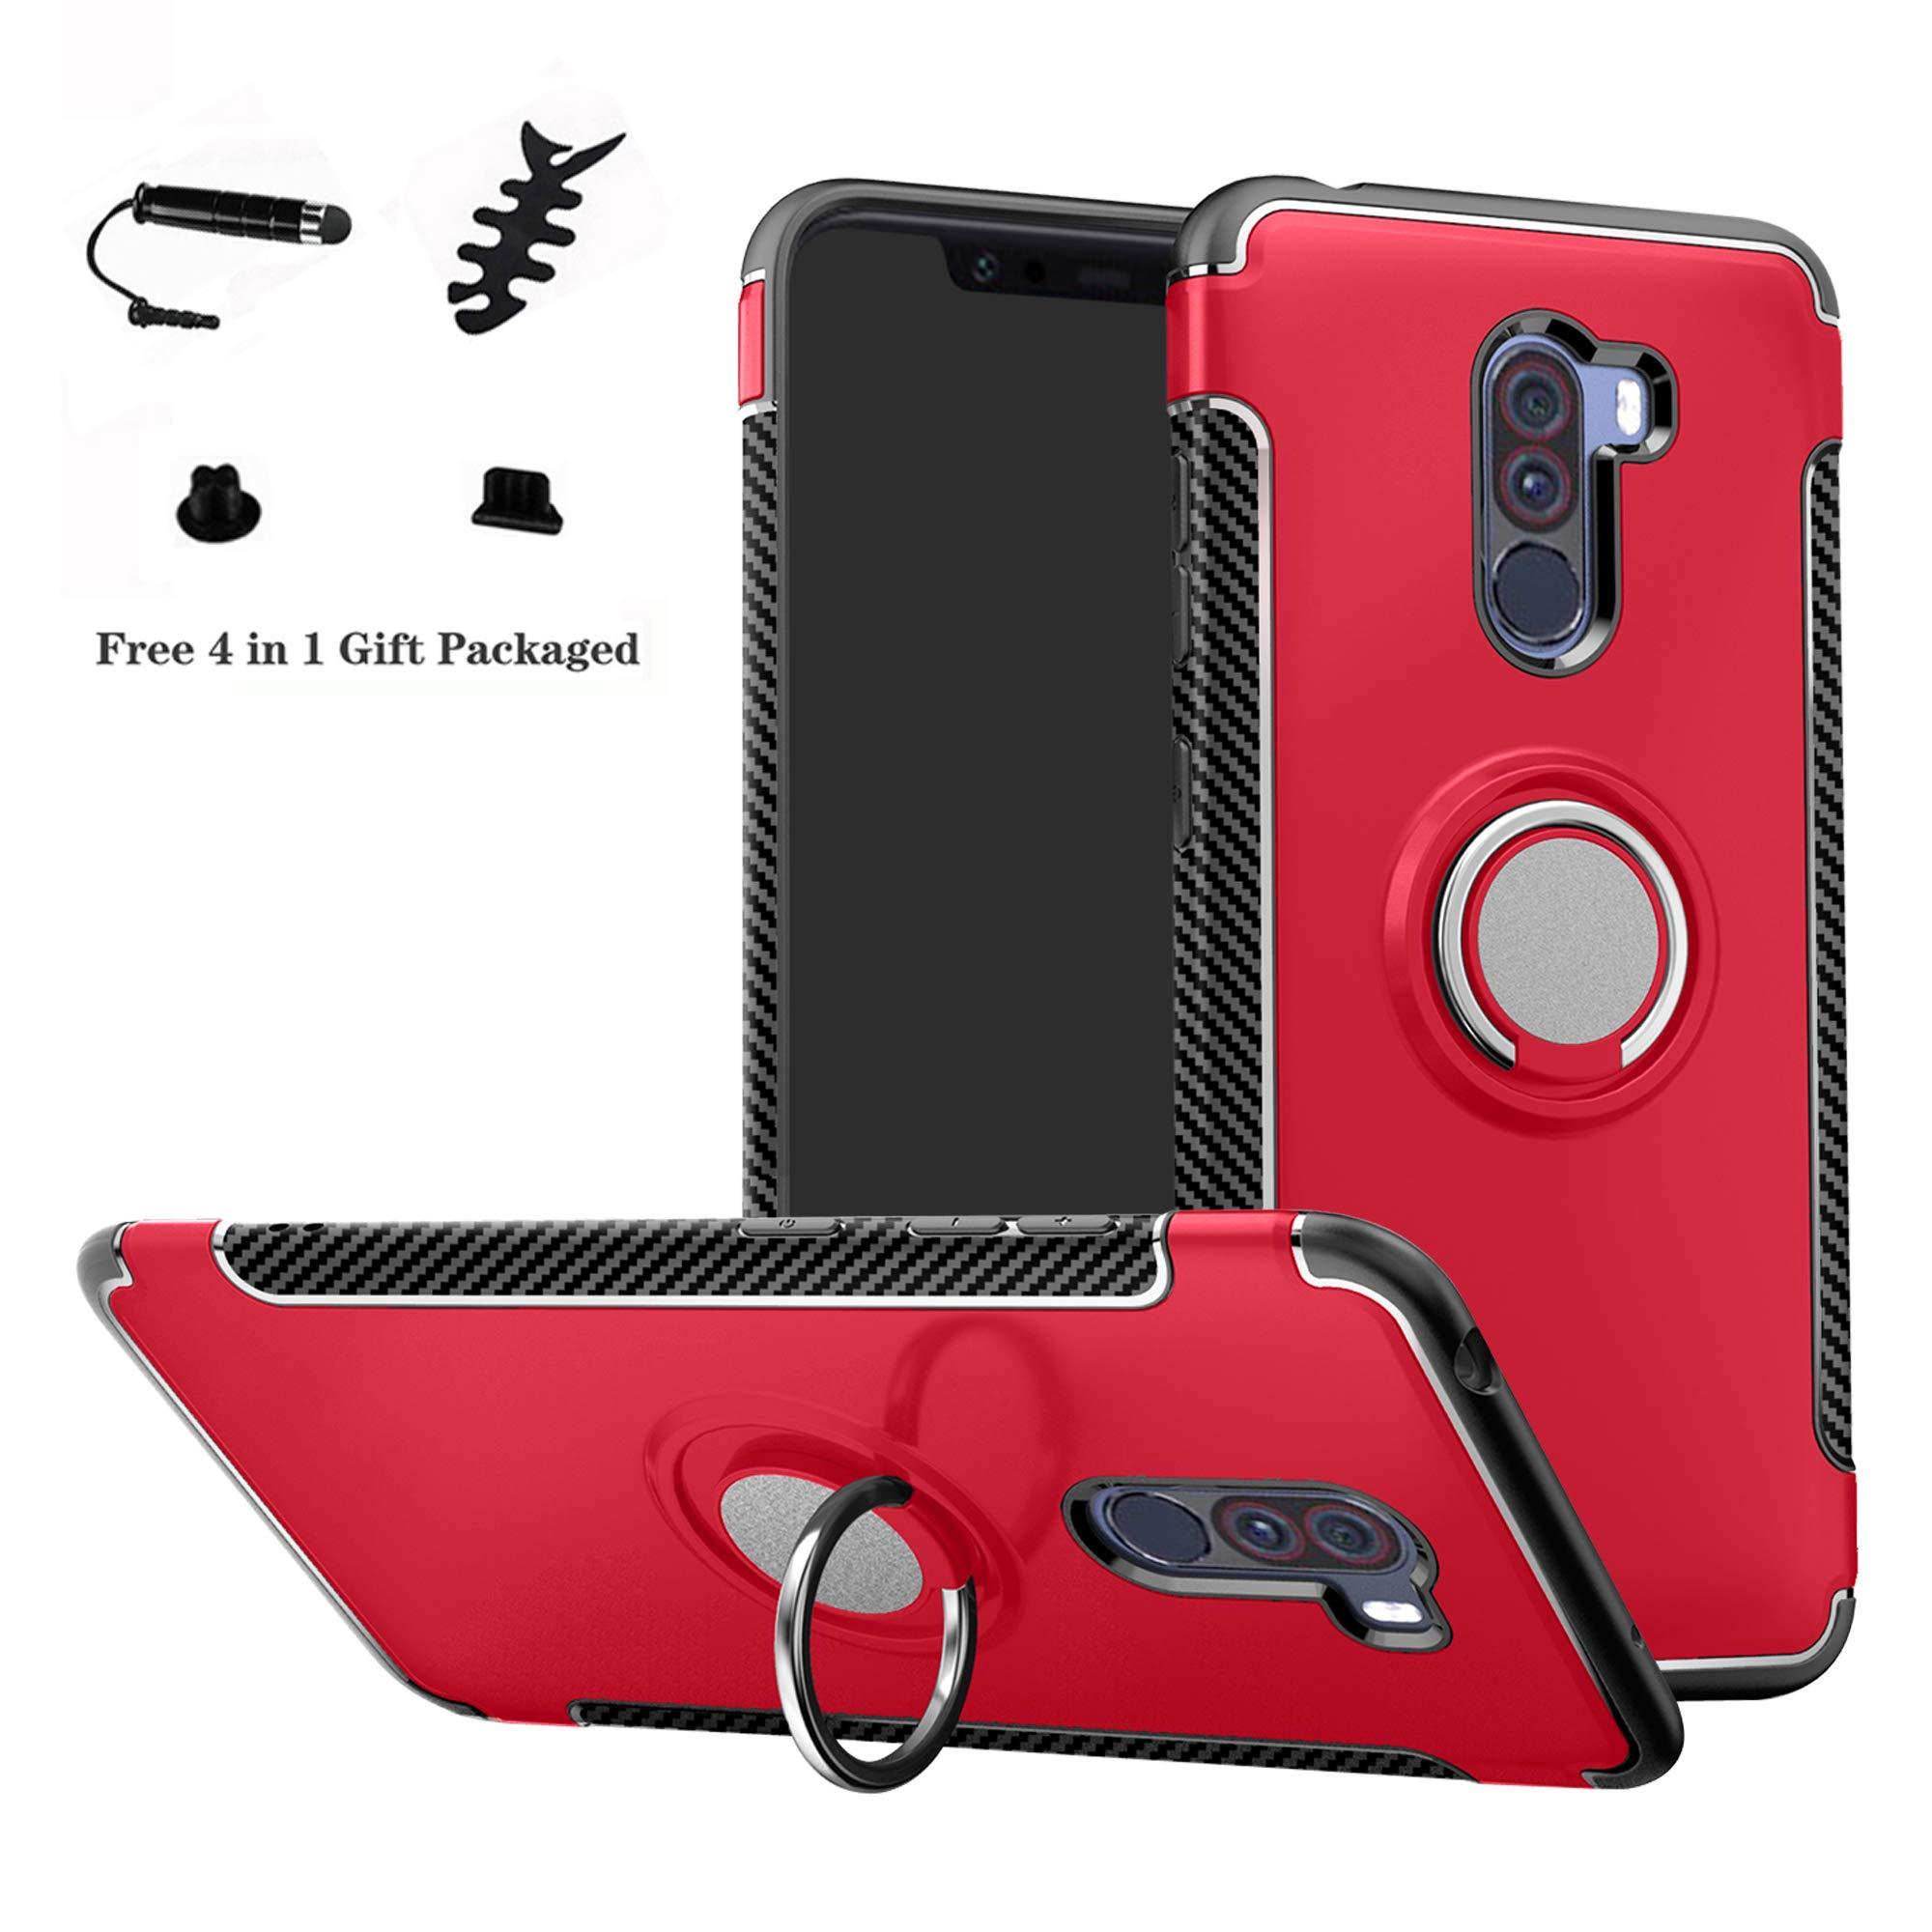 LFDZ Xiaomi Pocophone F1 Anillo Soporte Funda 360 Grados Giratorio Ring Grip con Gel TPU Case Carcasa Fundas para Xiaomi Pocophone F1 Smartphone(con 4 en 1 Regalo empaquetado),Rojo: Amazon.es: Electrónica